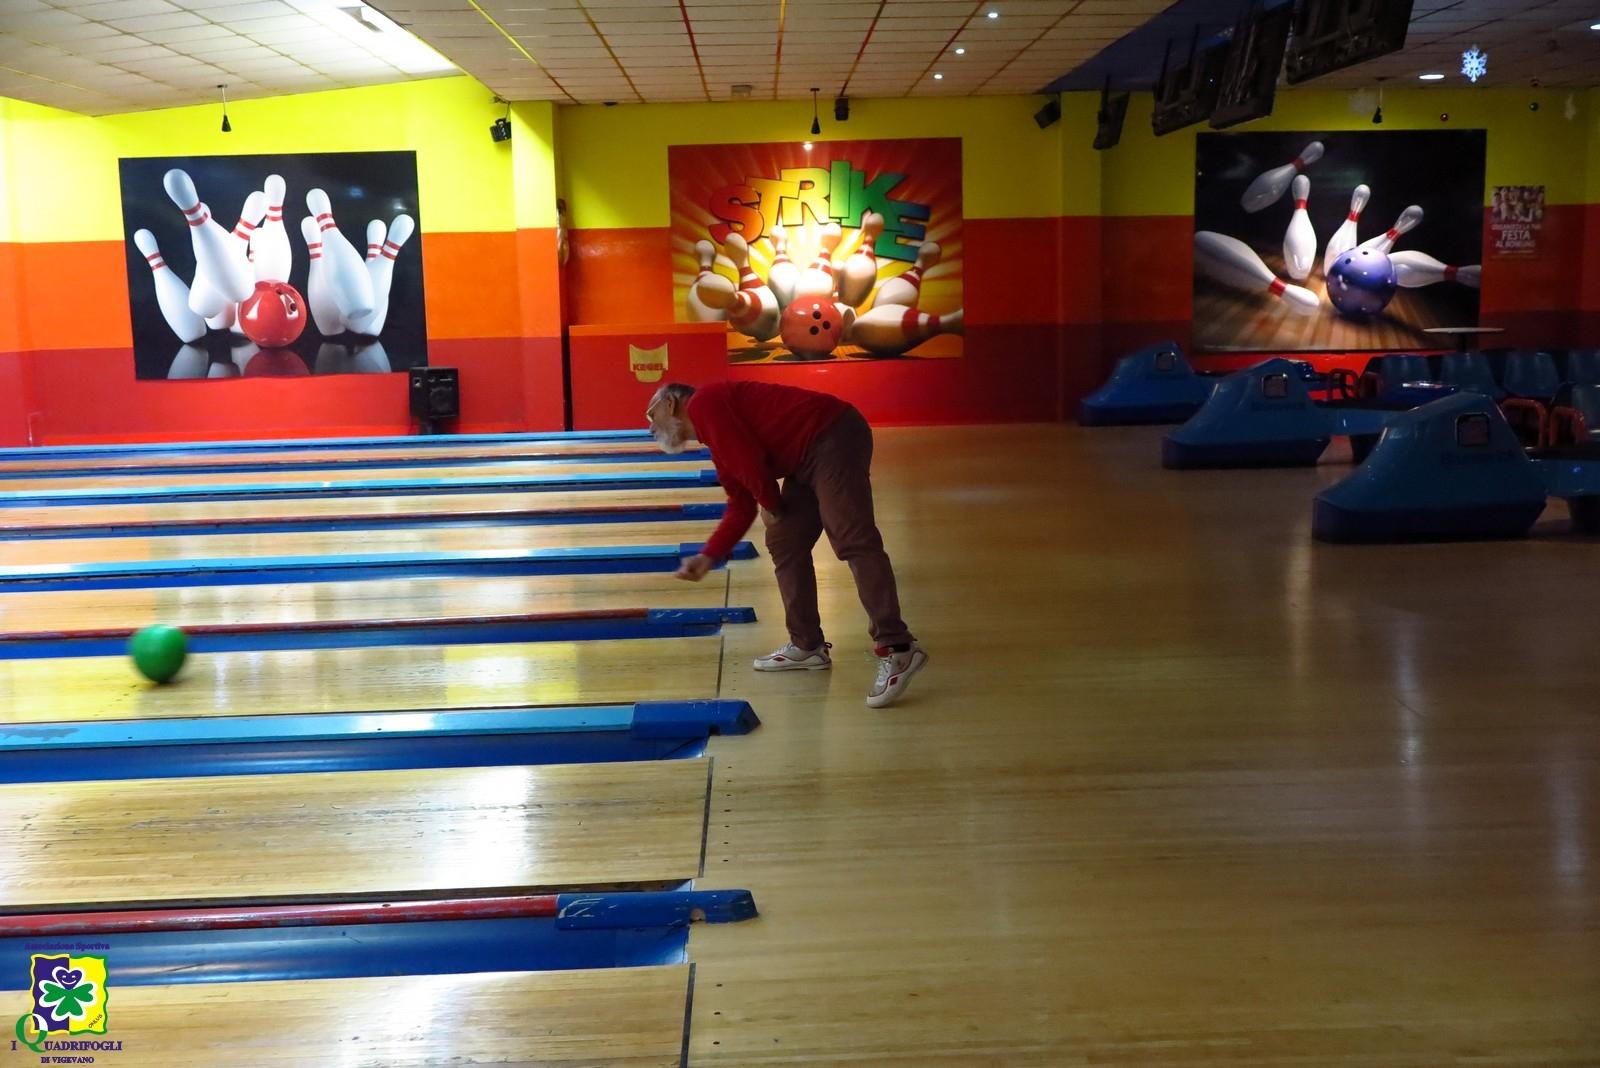 Torneo Bowling Vigevano 19-12-2018 - 011